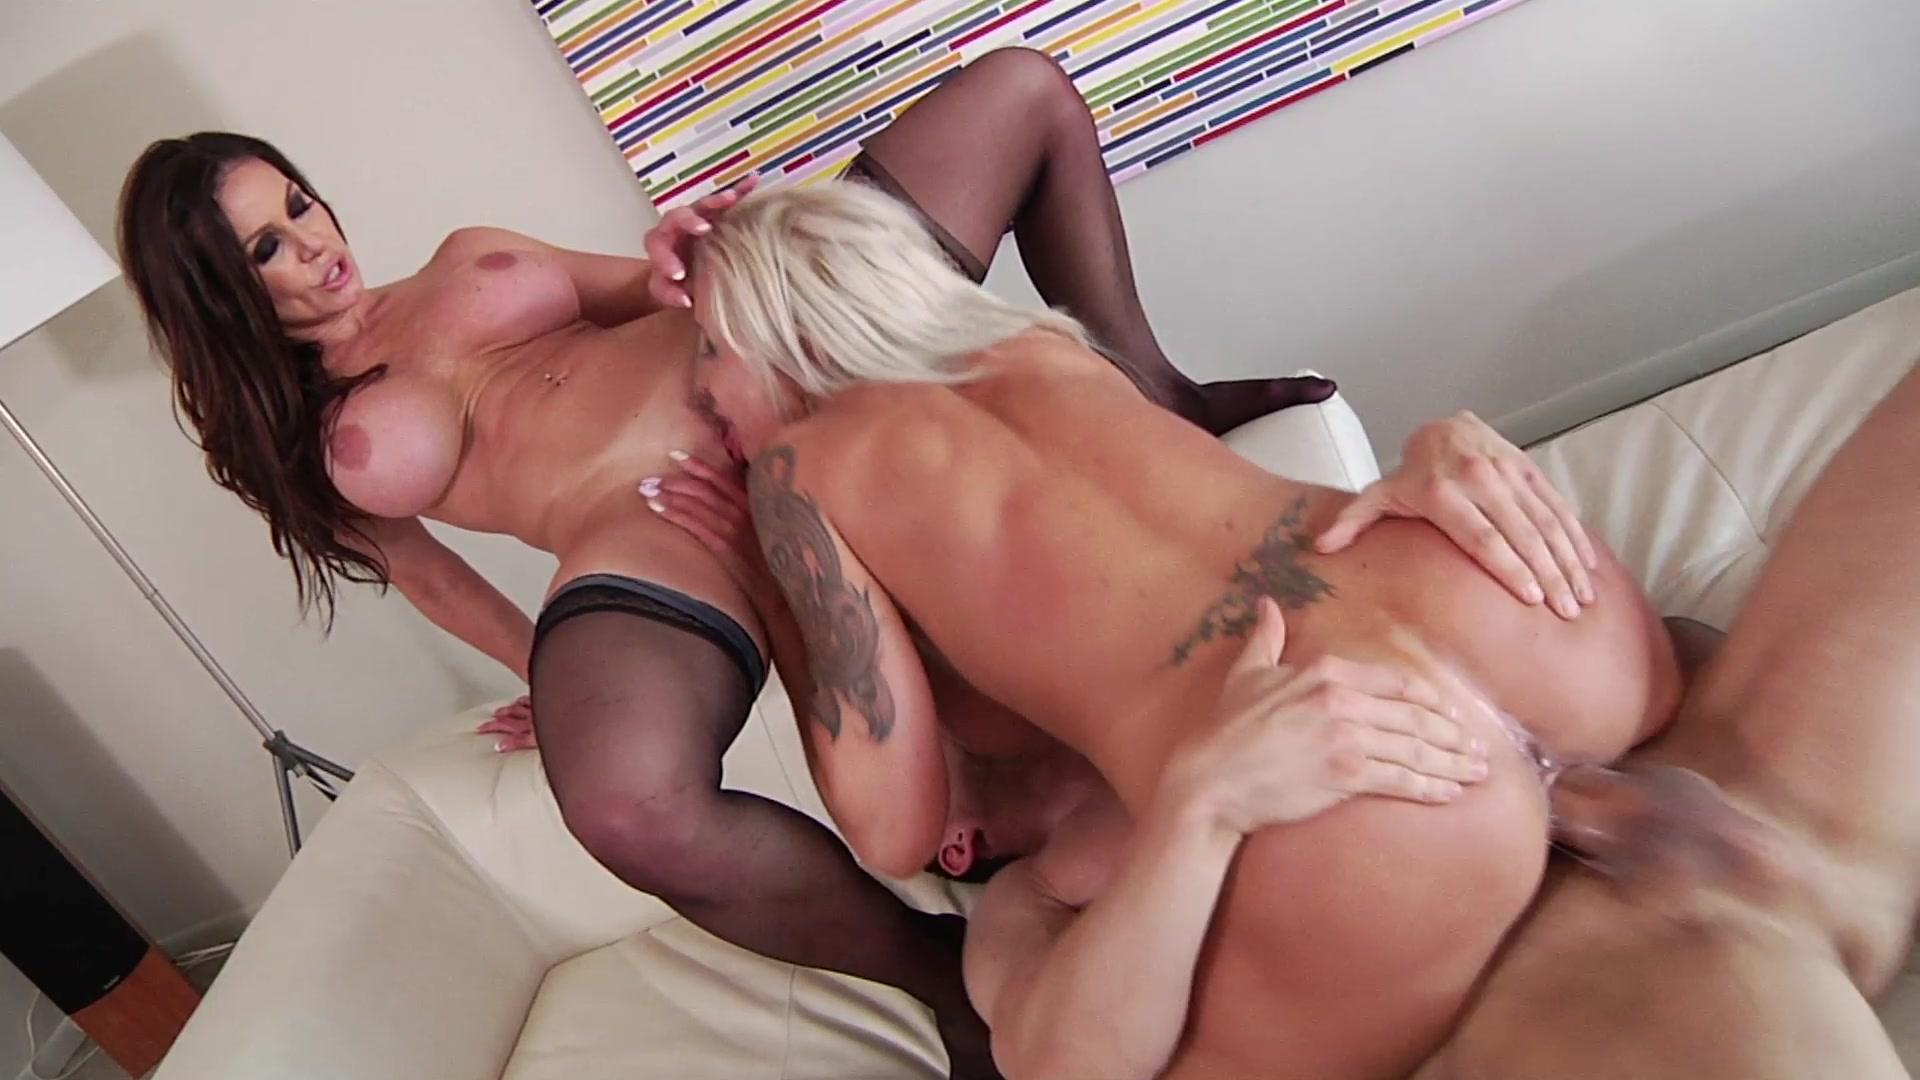 big dick threesome free porno transexual